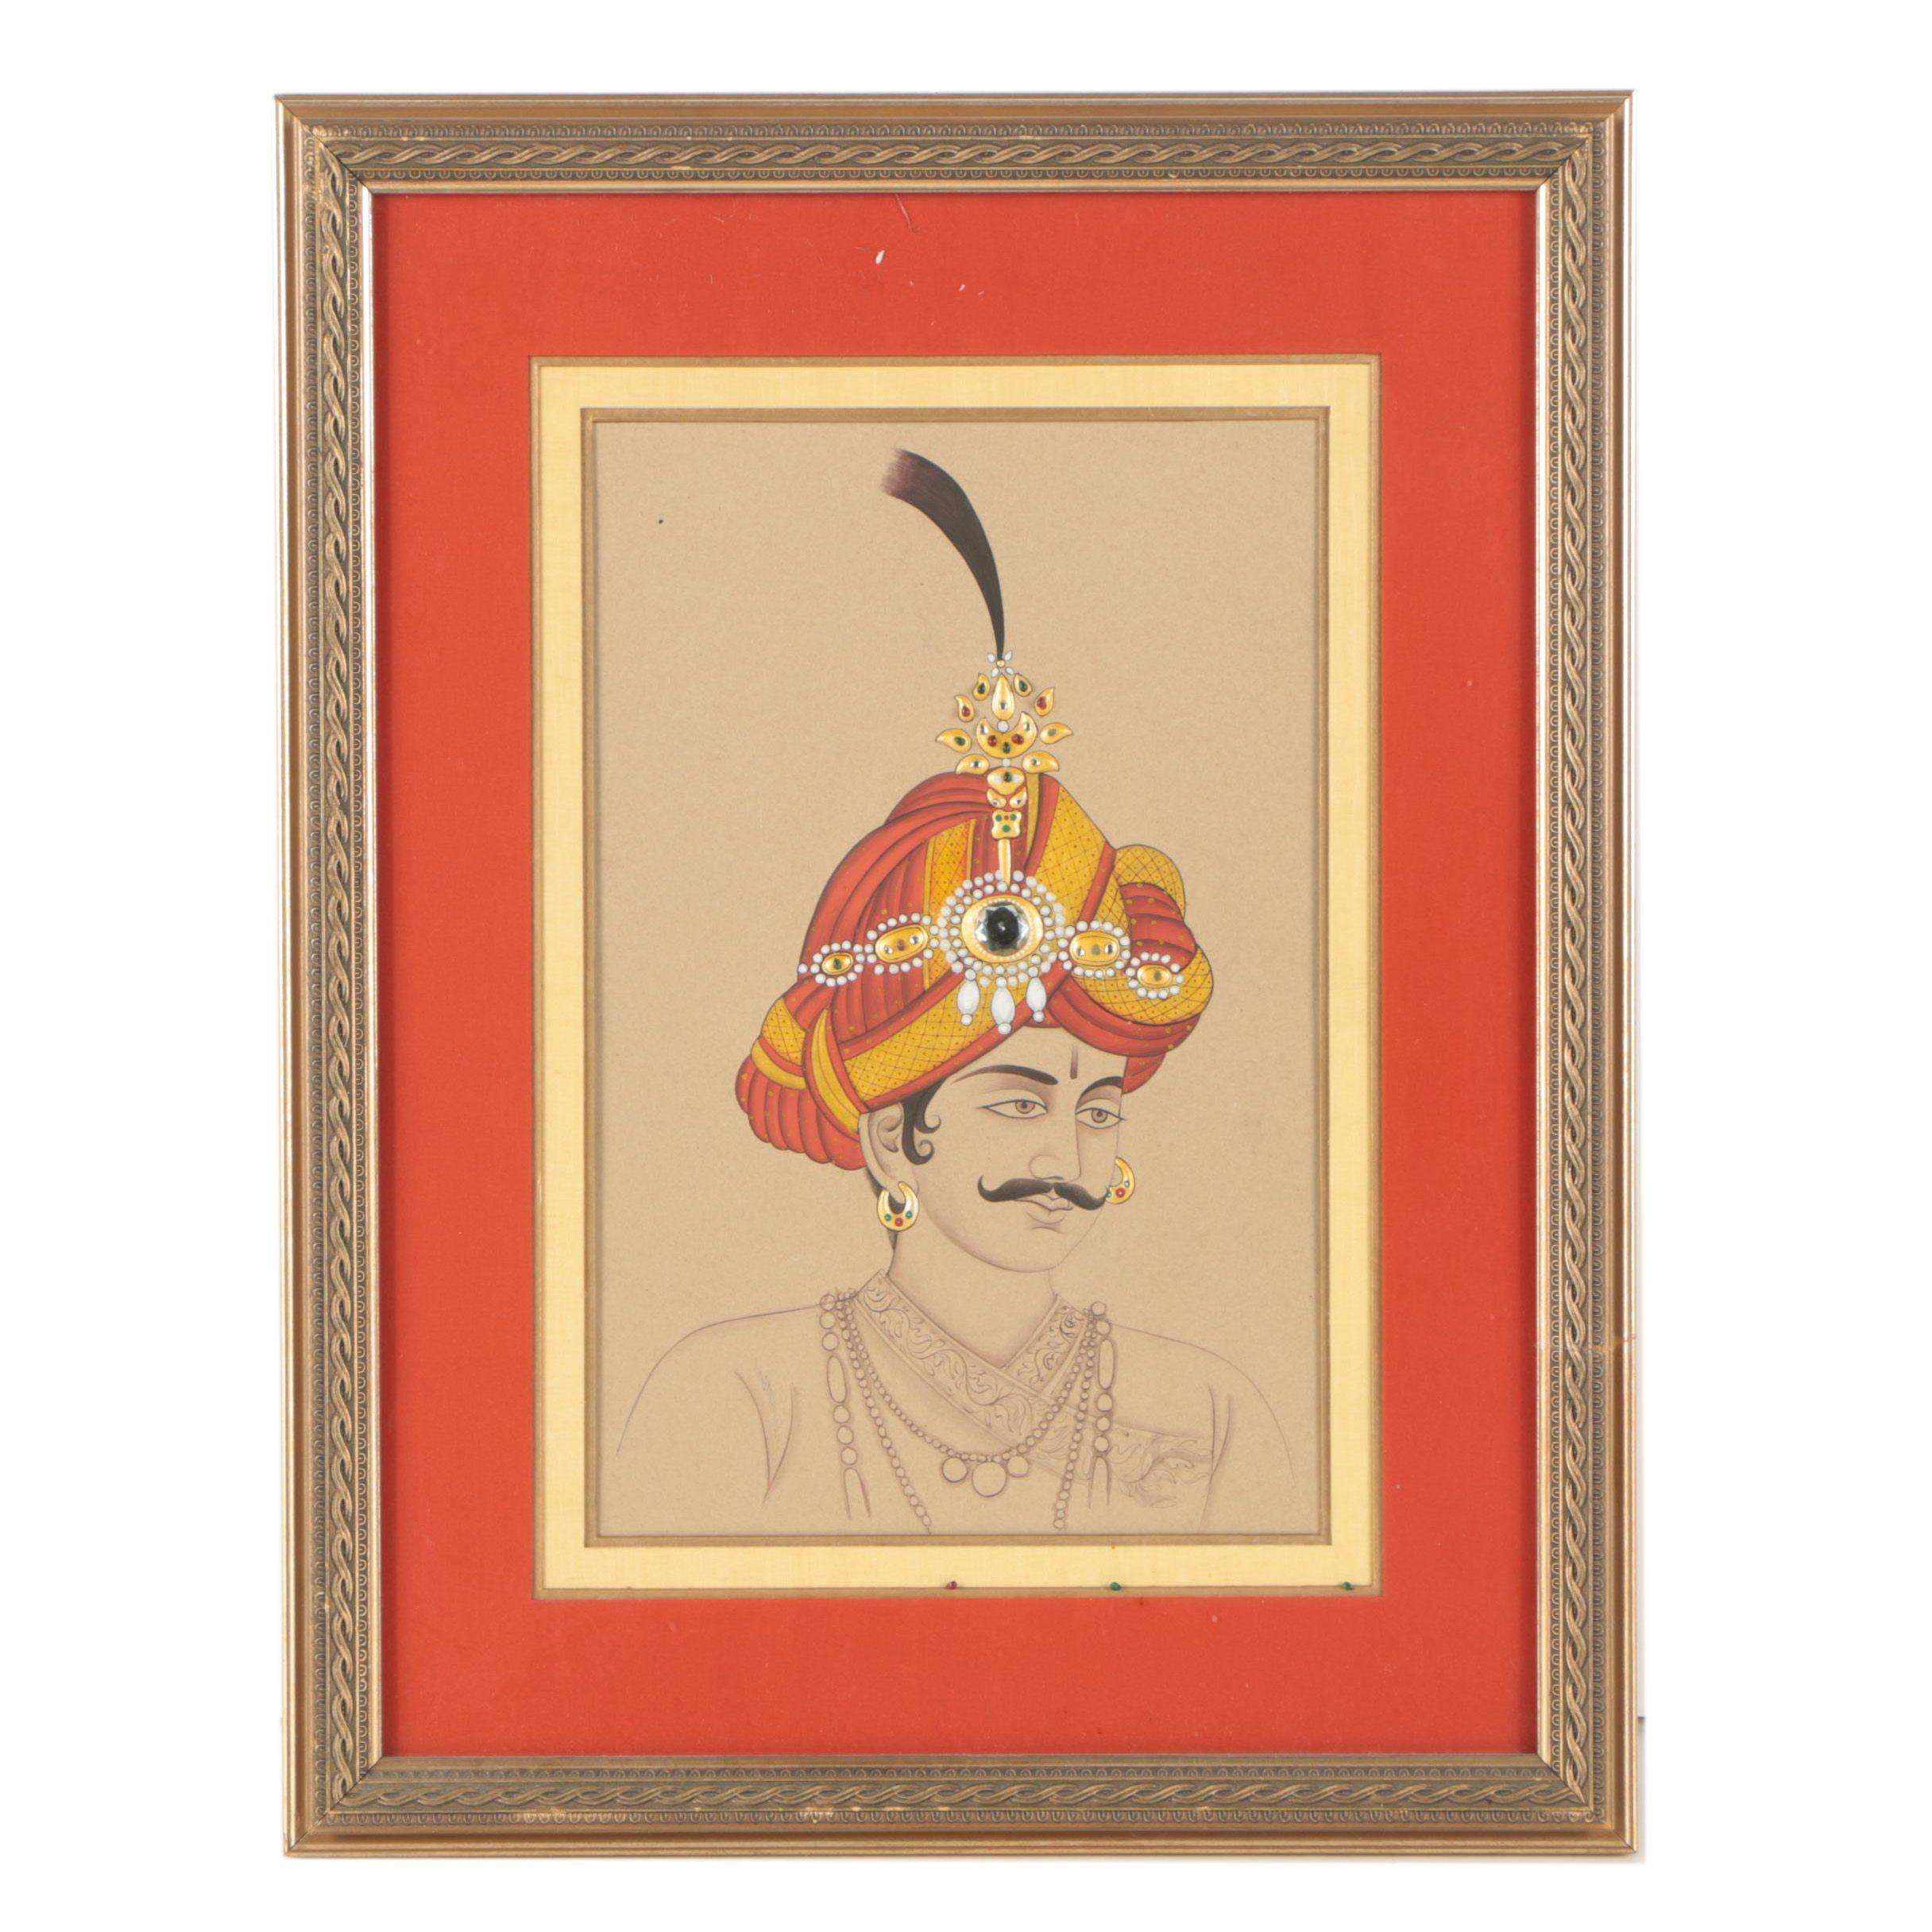 Embellished Gouache Portrait of a Man